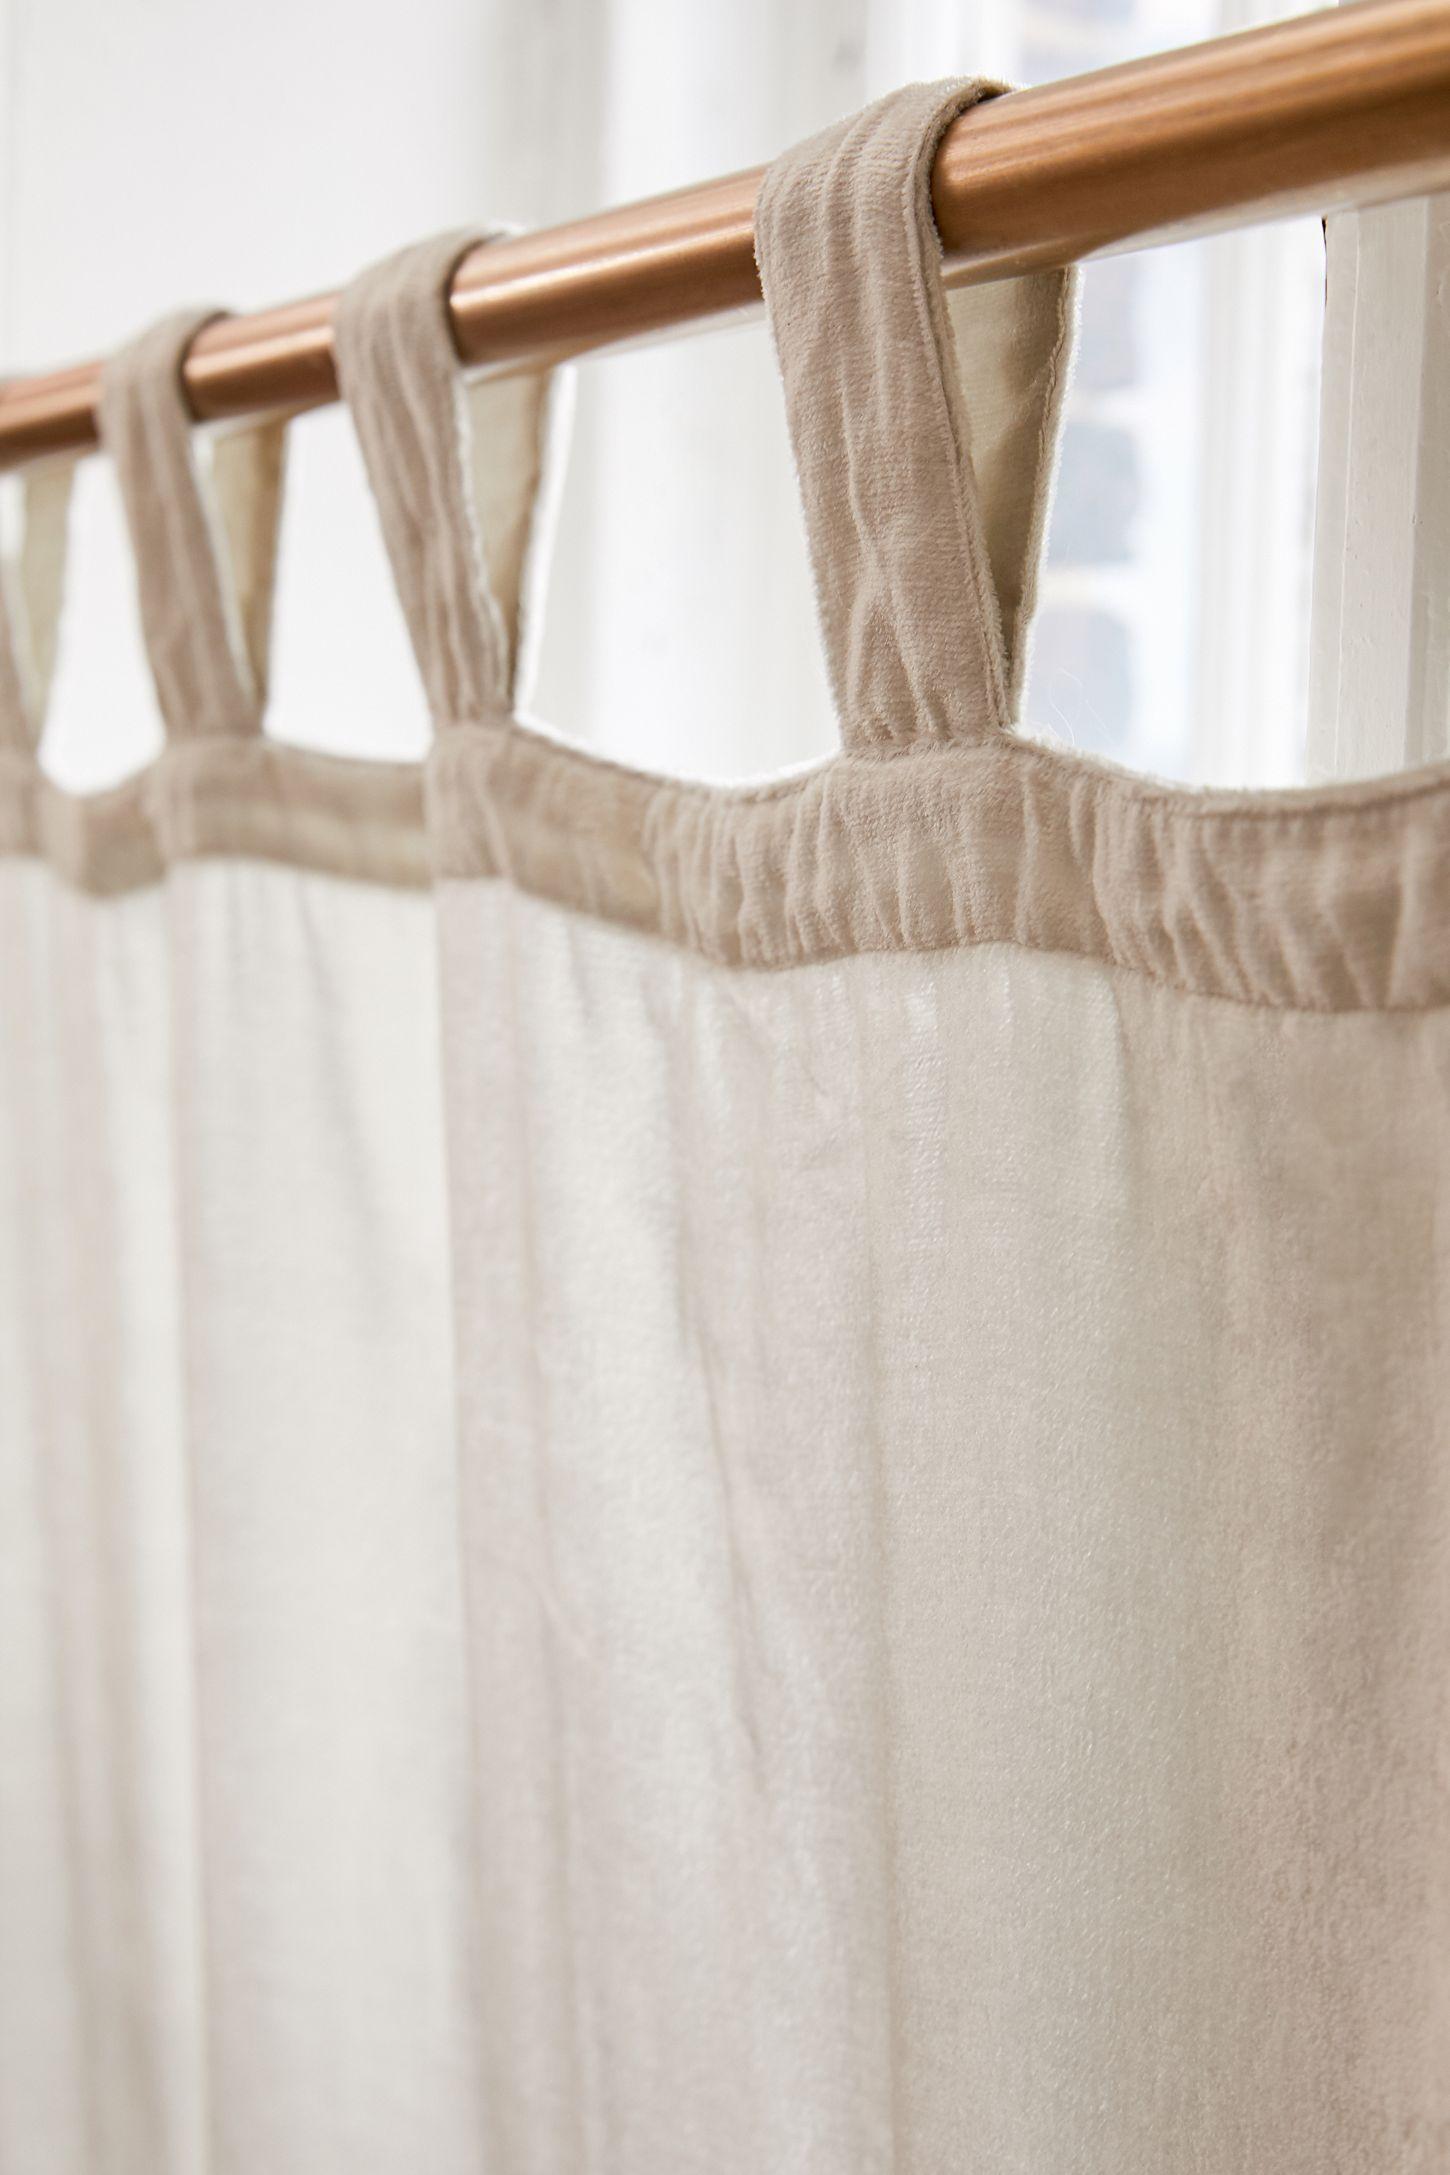 Luxury Crushed Velvet Eyelet Curtains Very Co Uk Velvet Curtains Bedroom Velvet Bedroom Curtains Living Room